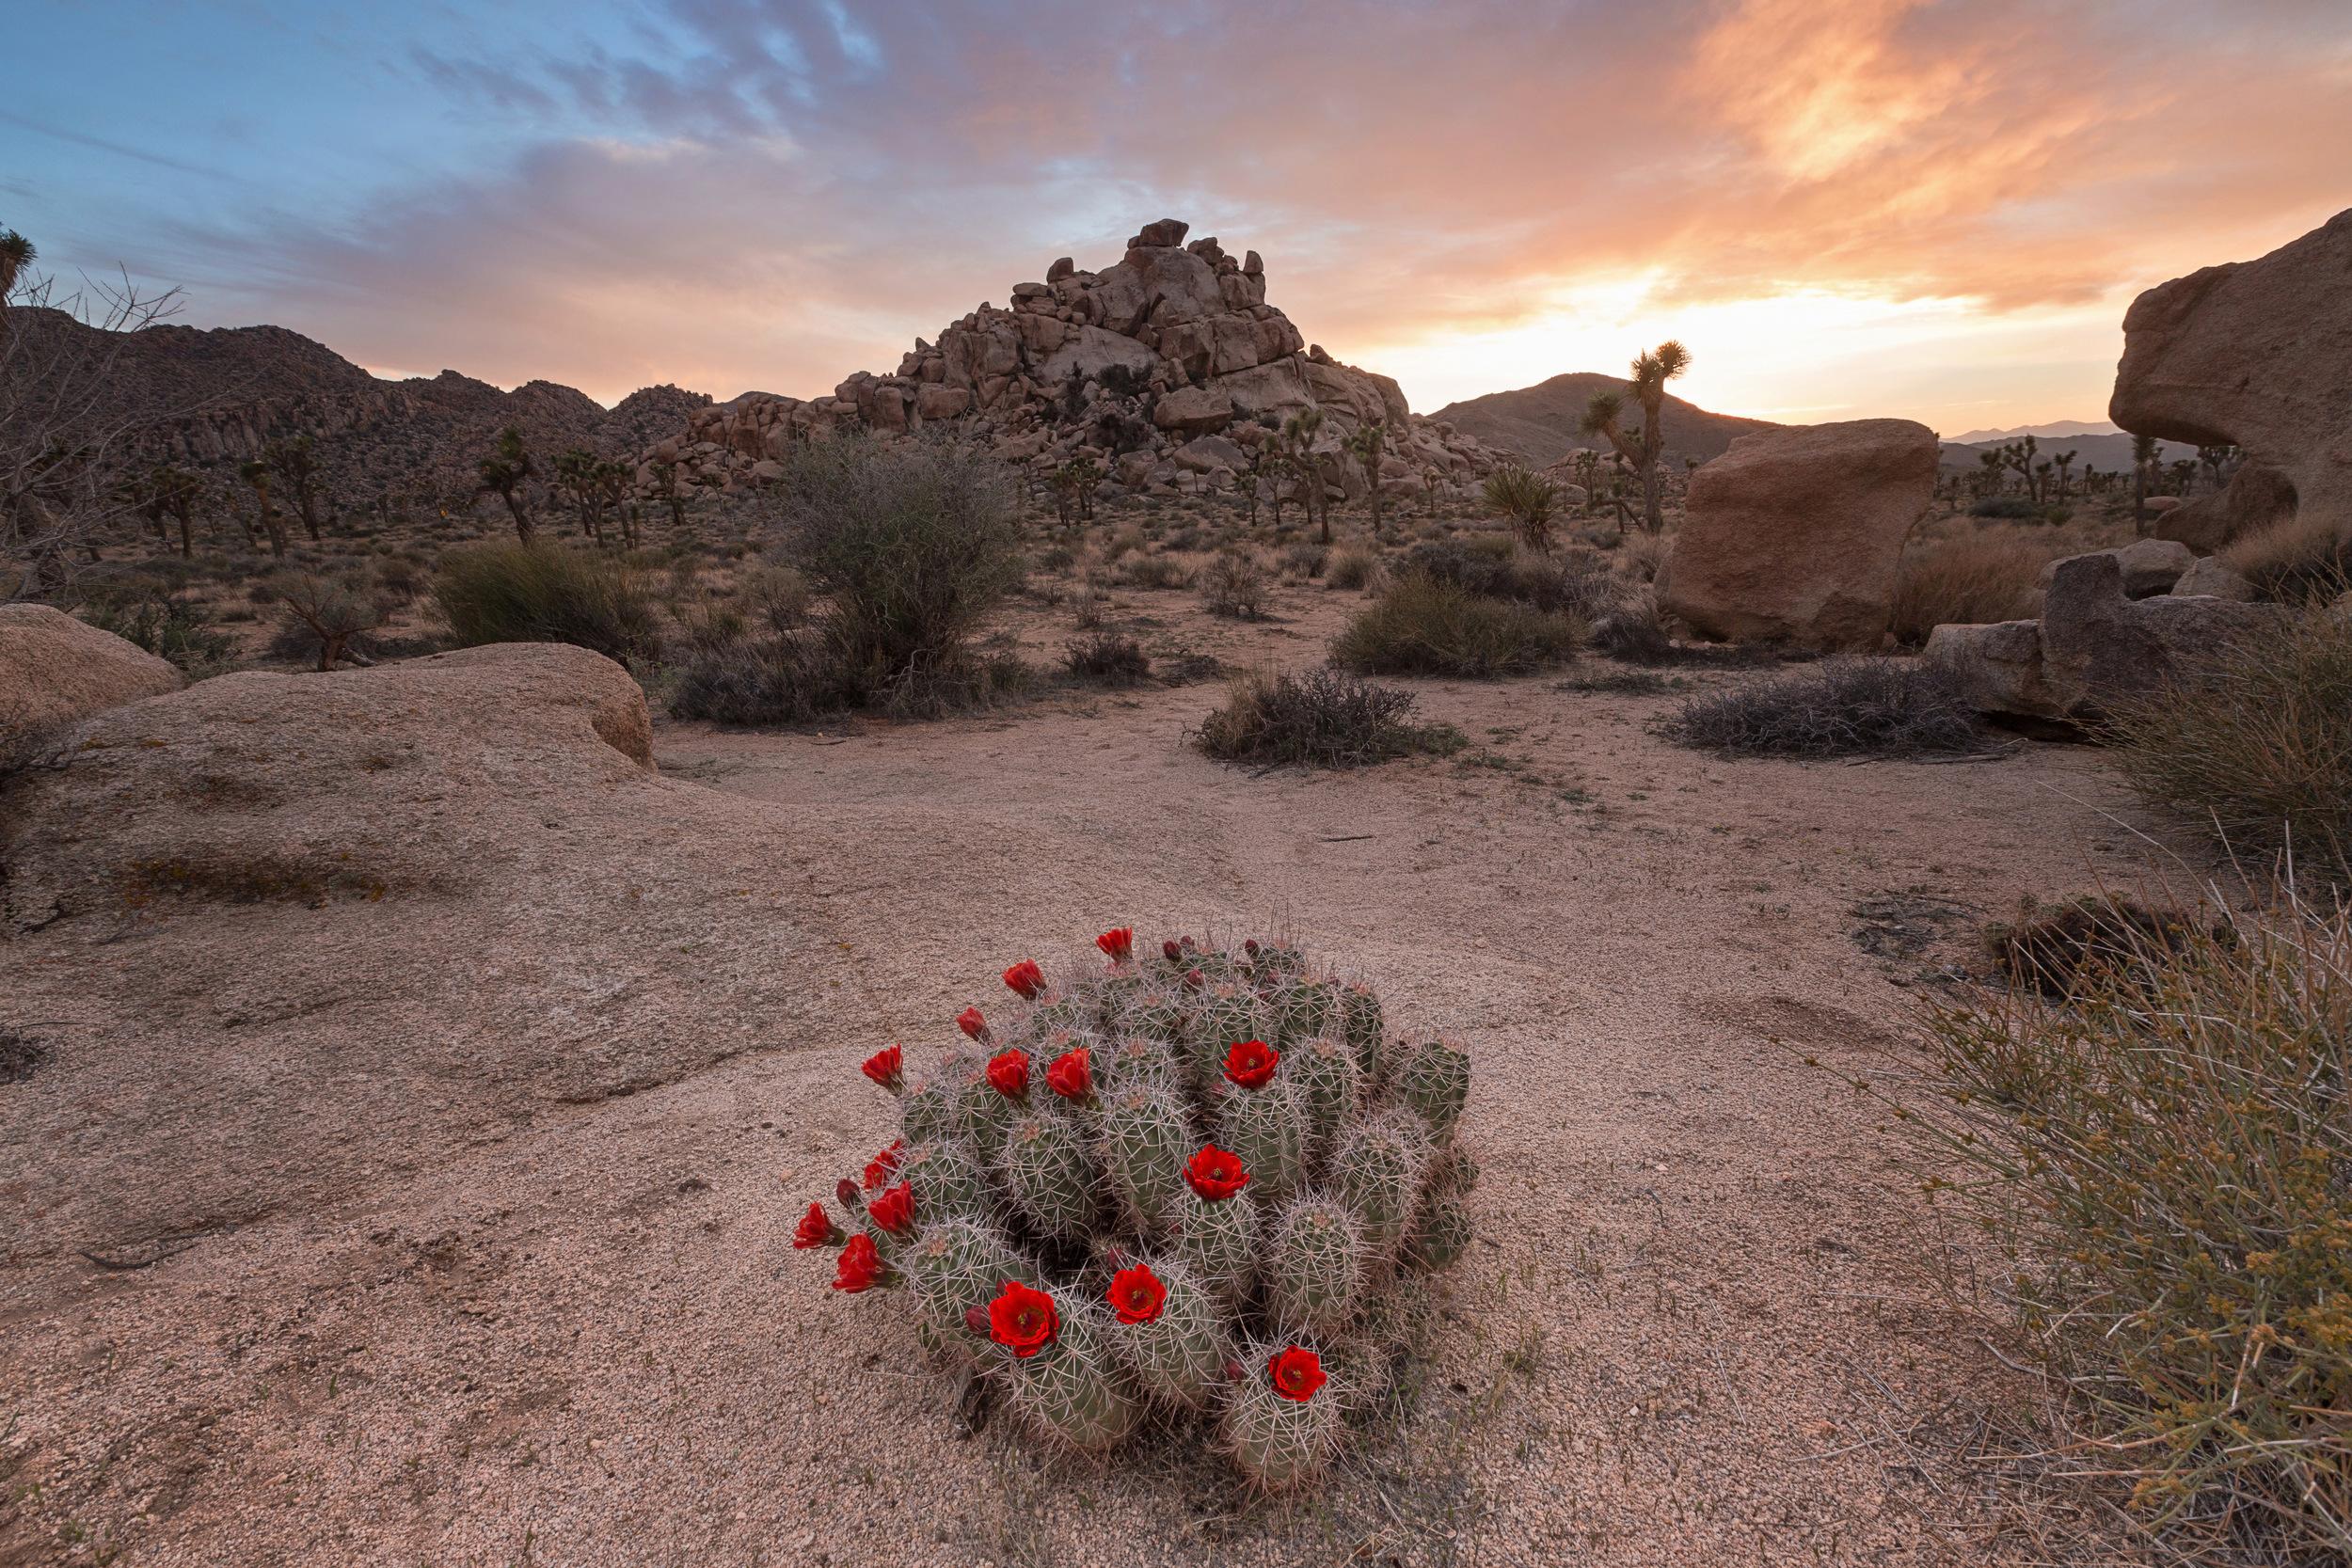 Blooming Cactus (Photo: Romiana Lee/Shutterstock)